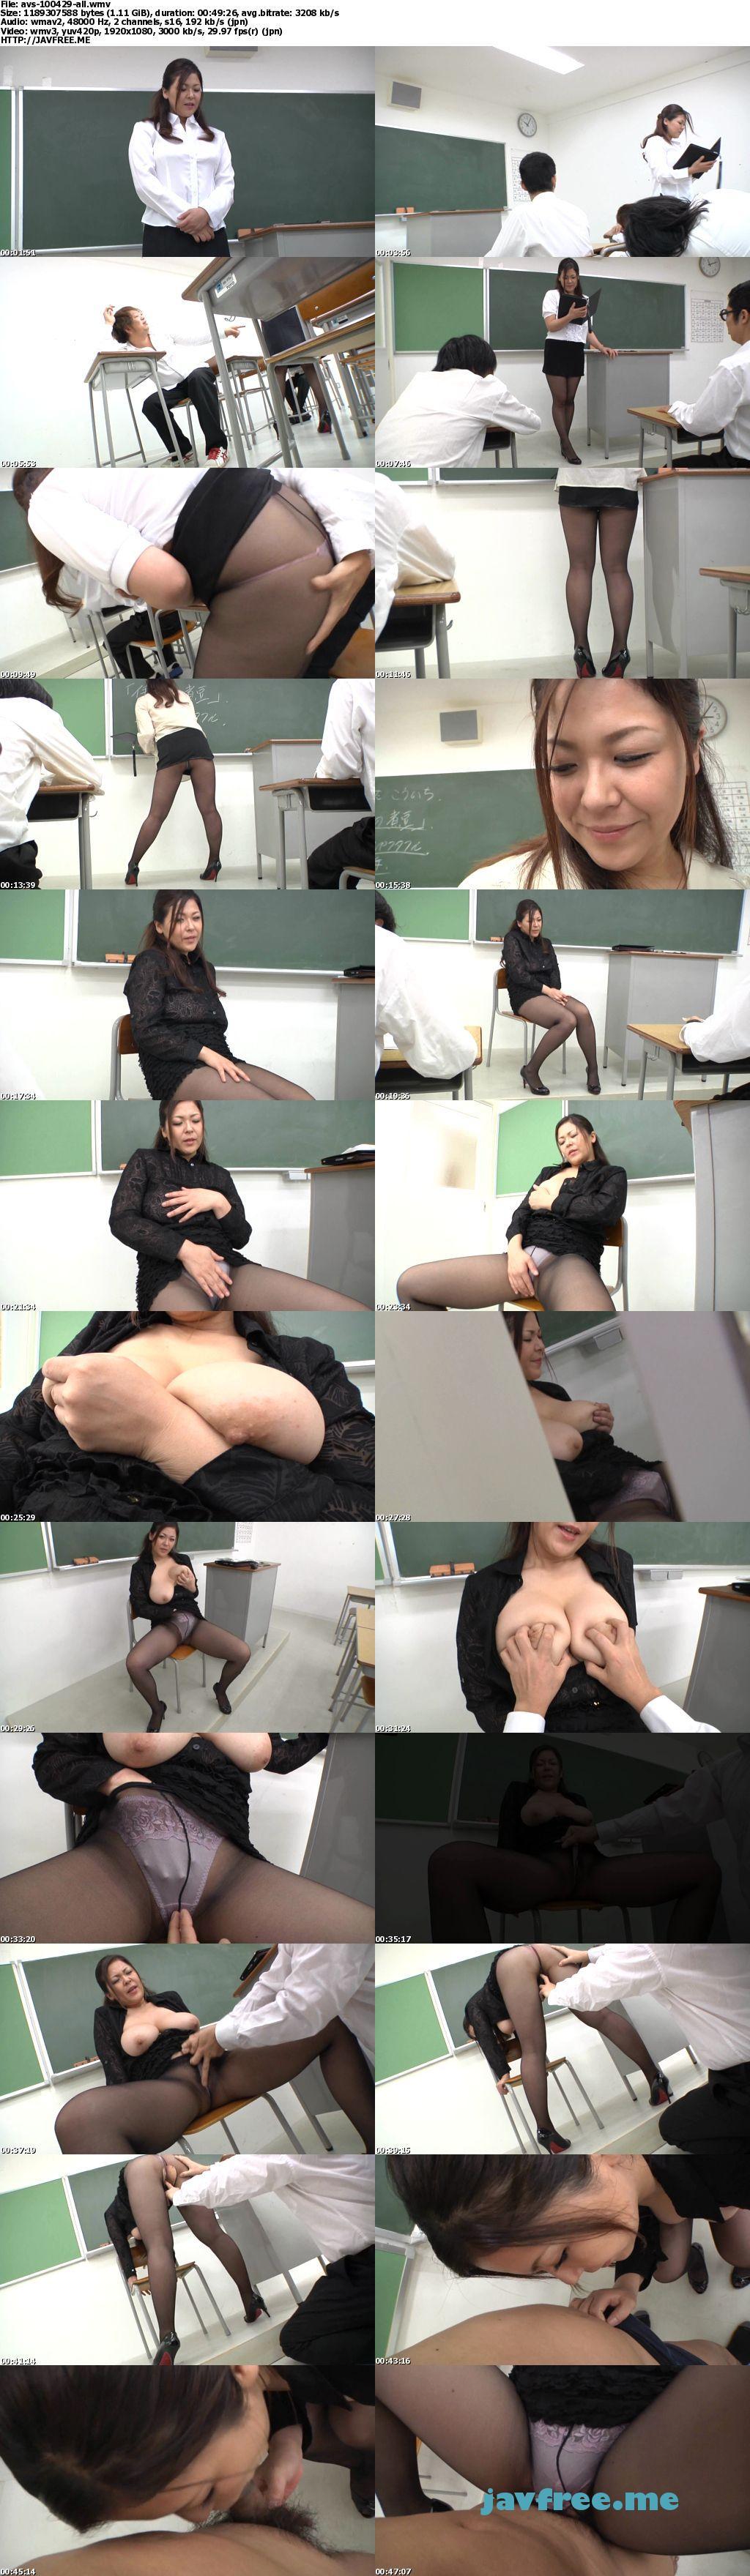 [DPHN-134] 非日常的悶絶遊戯 不良学生のクラスを受け持つ女教師、夕樹の場合 - image avs-100429-all on https://javfree.me